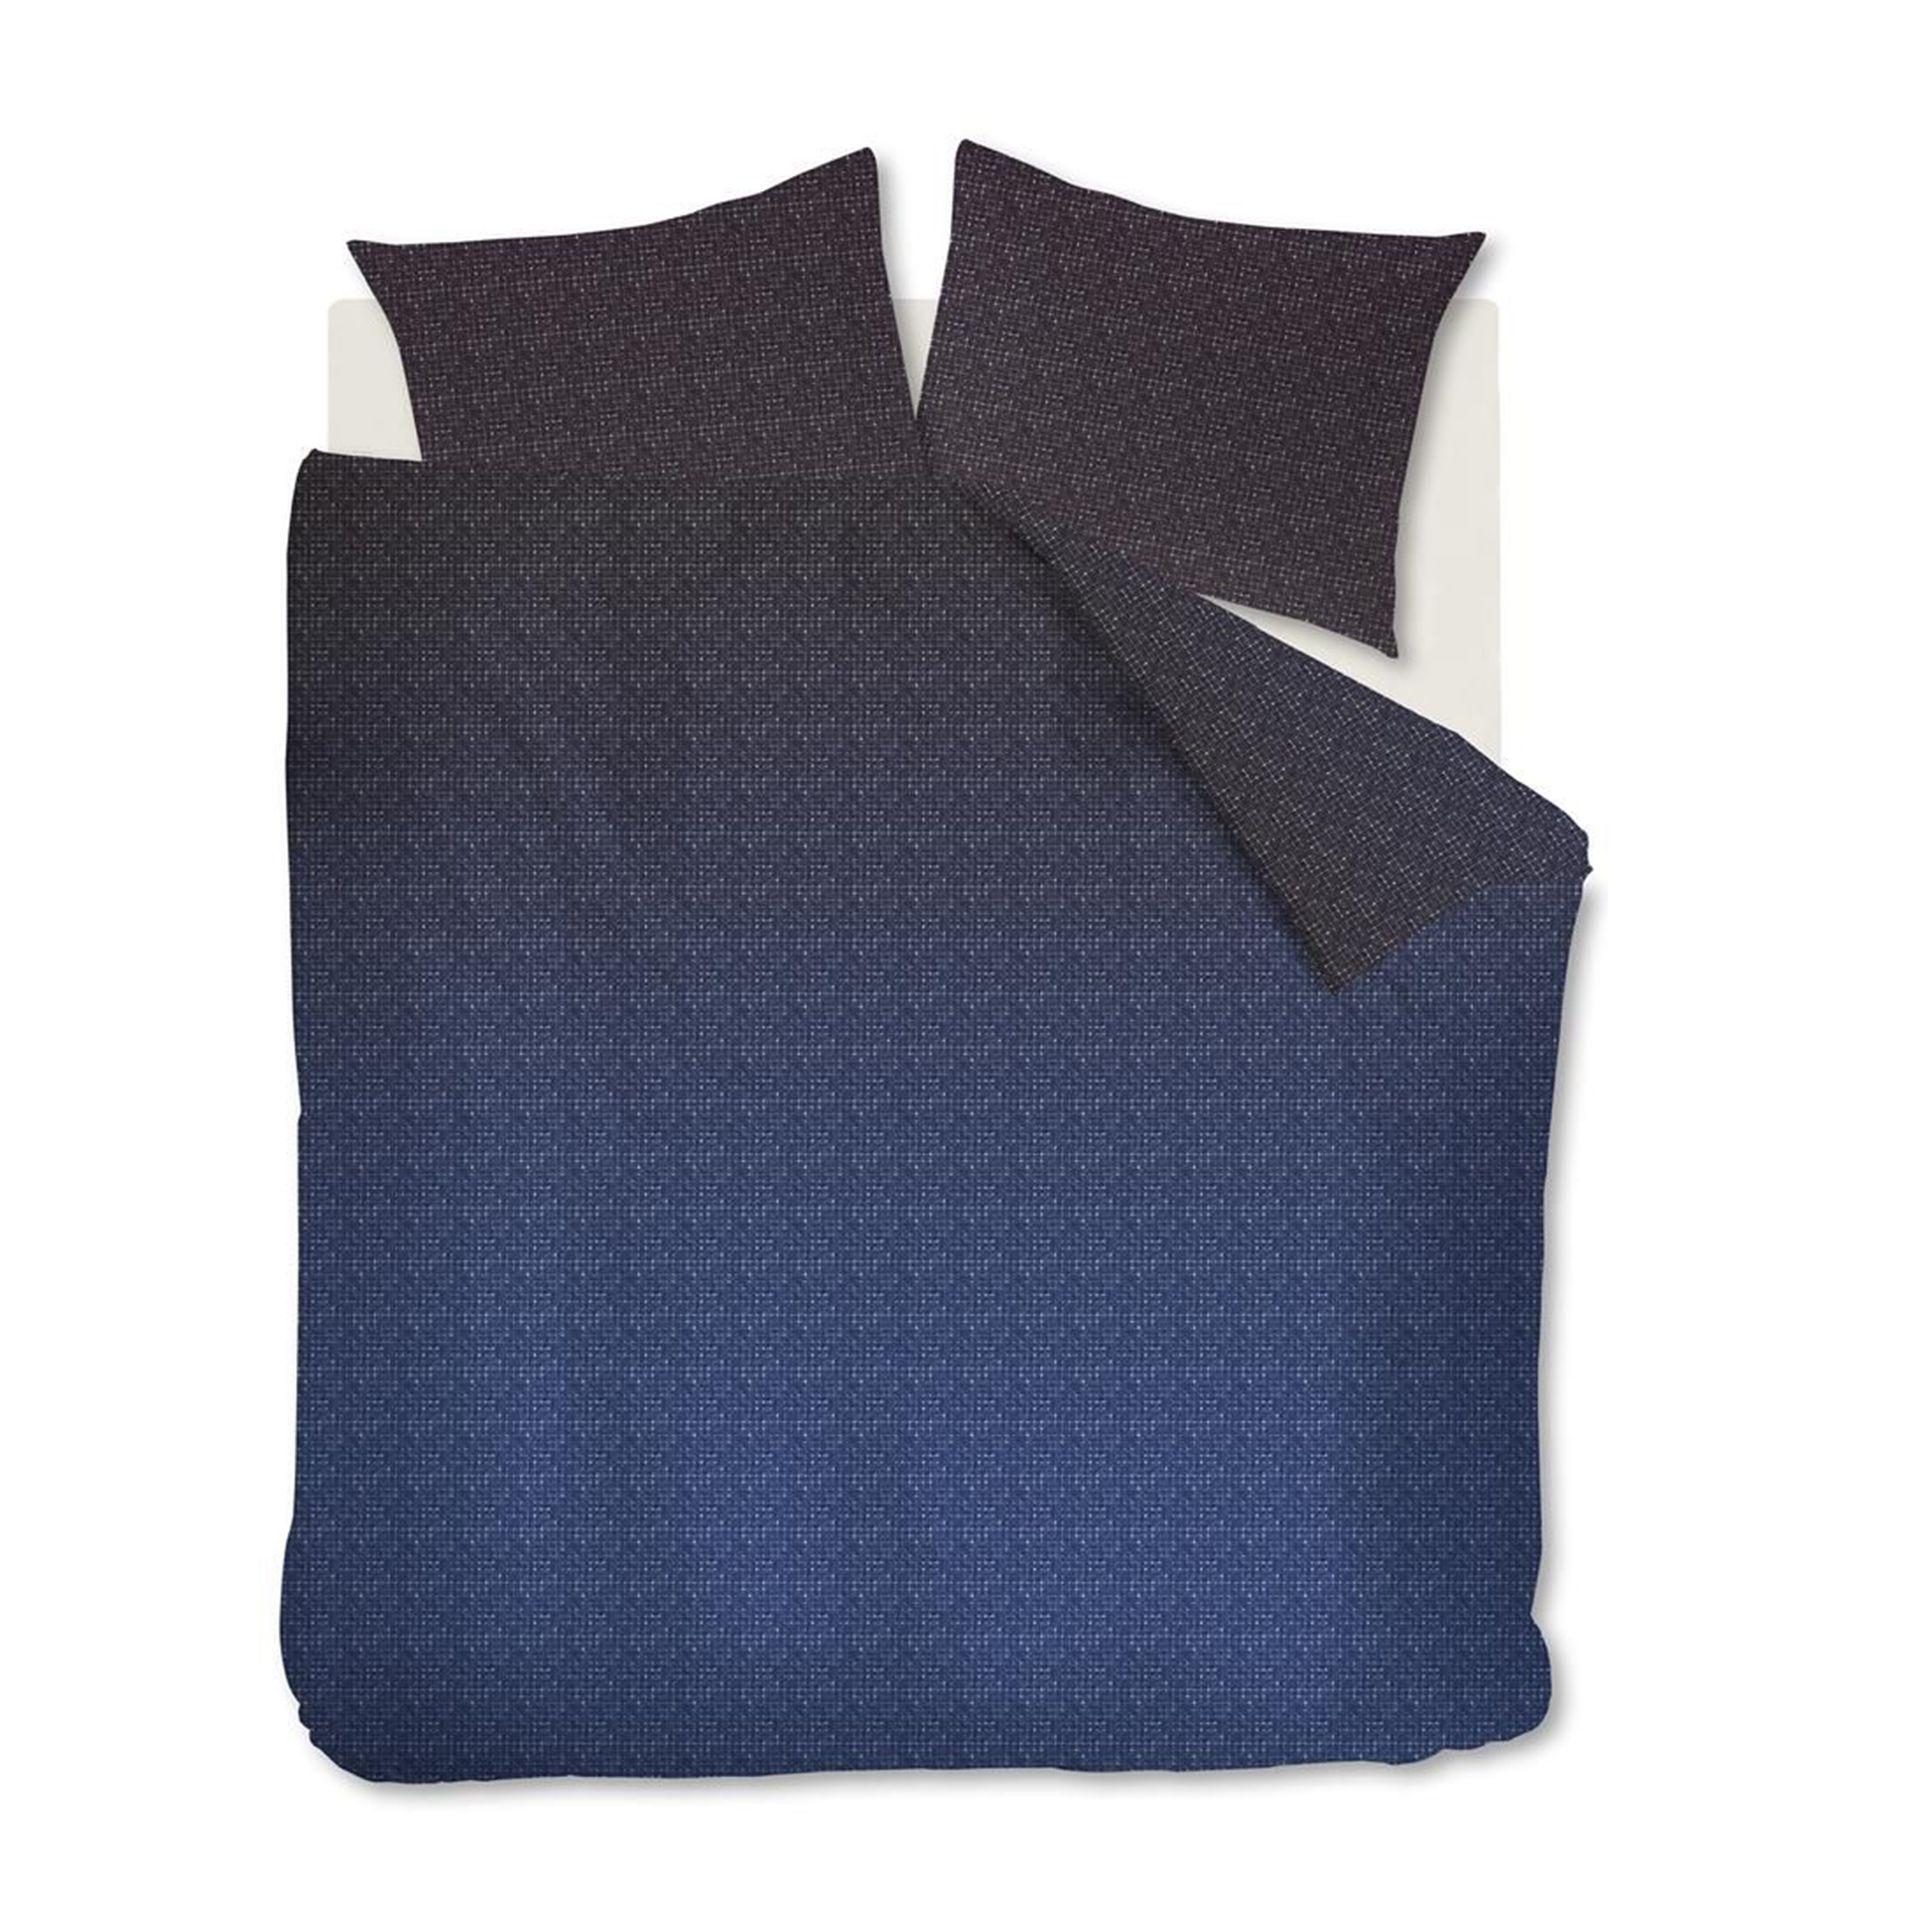 Auping - Indigio blue dekbedovertrek